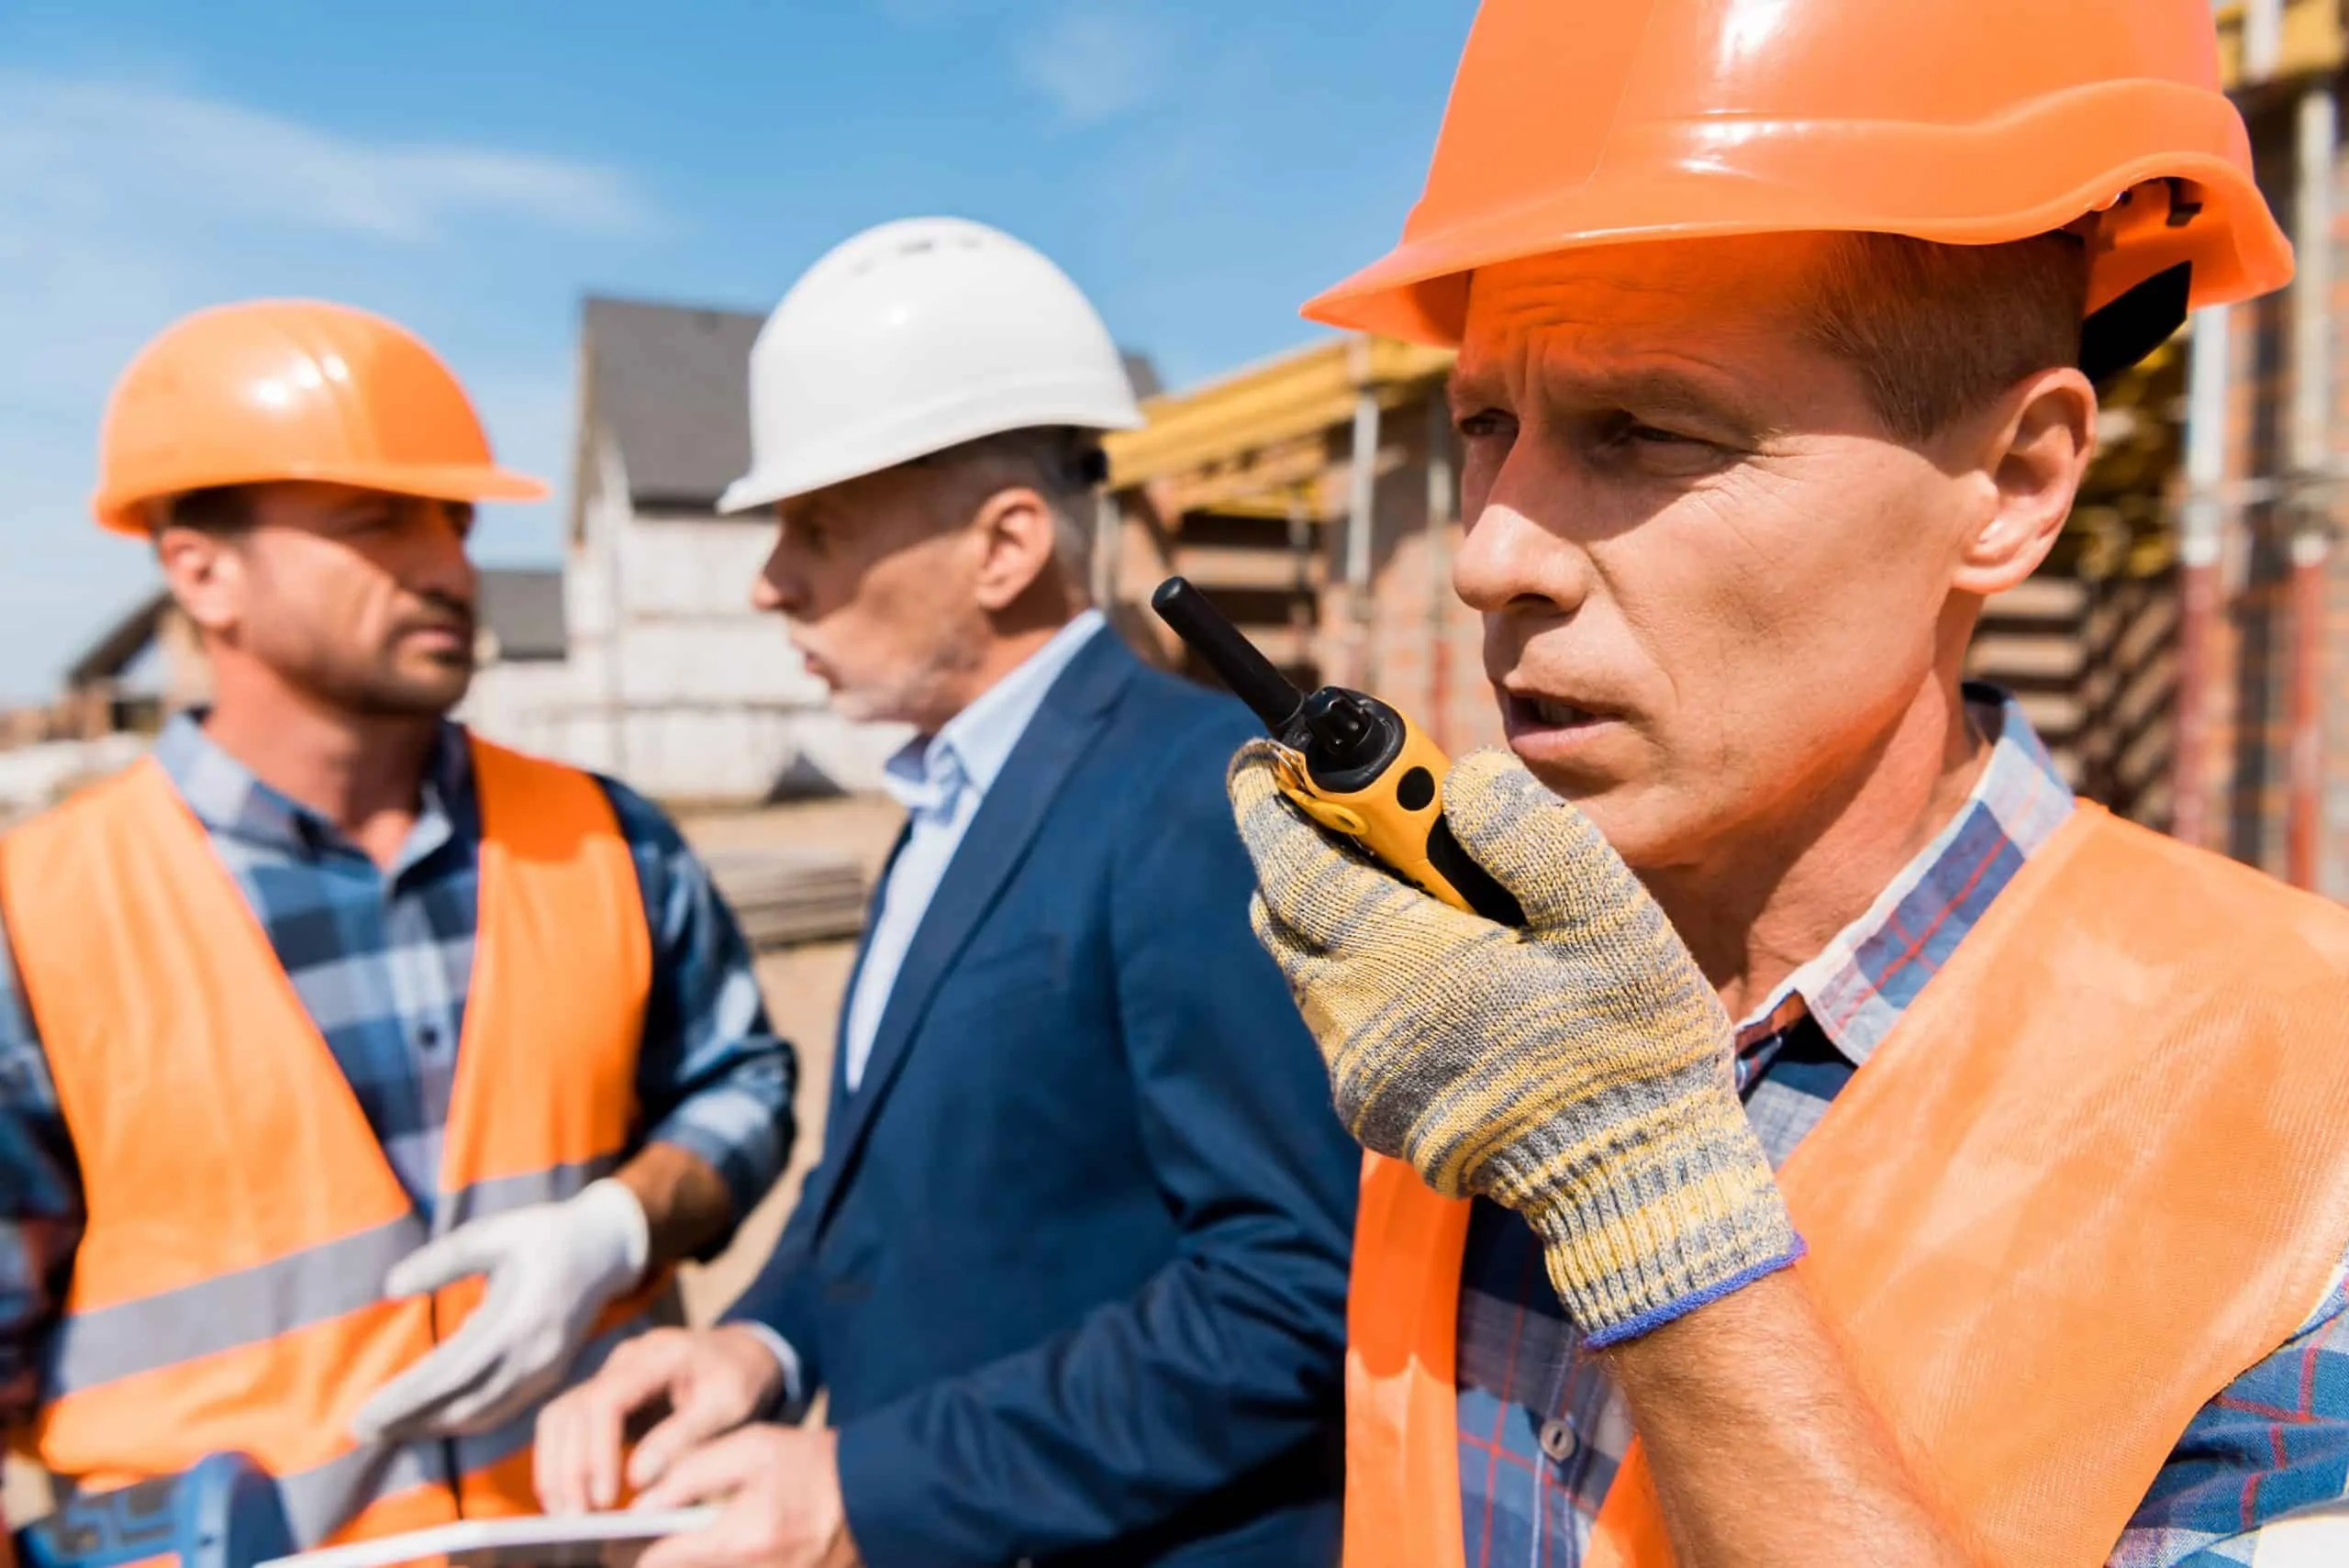 Construction Worker Using a Walkie Talkie